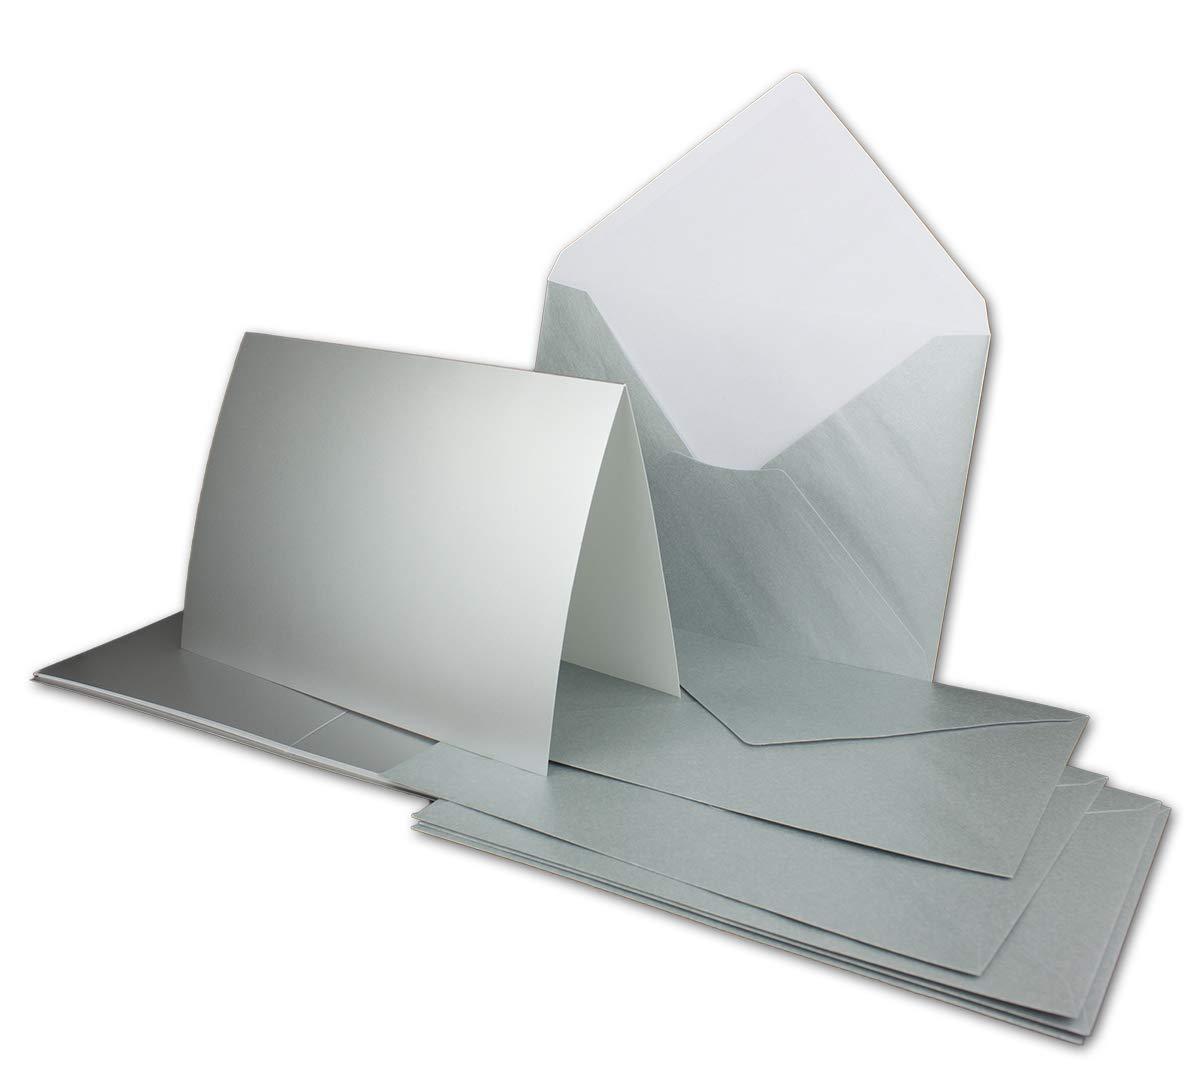 75 Sets - Faltkarten Hellgrau - Din A5  Umschläge Din C5 - Premium Qualität - Sehr formstabil - Qualitätsmarke  NEUSER FarbenFroh B07Q5SC8V7 | Mode-Muster